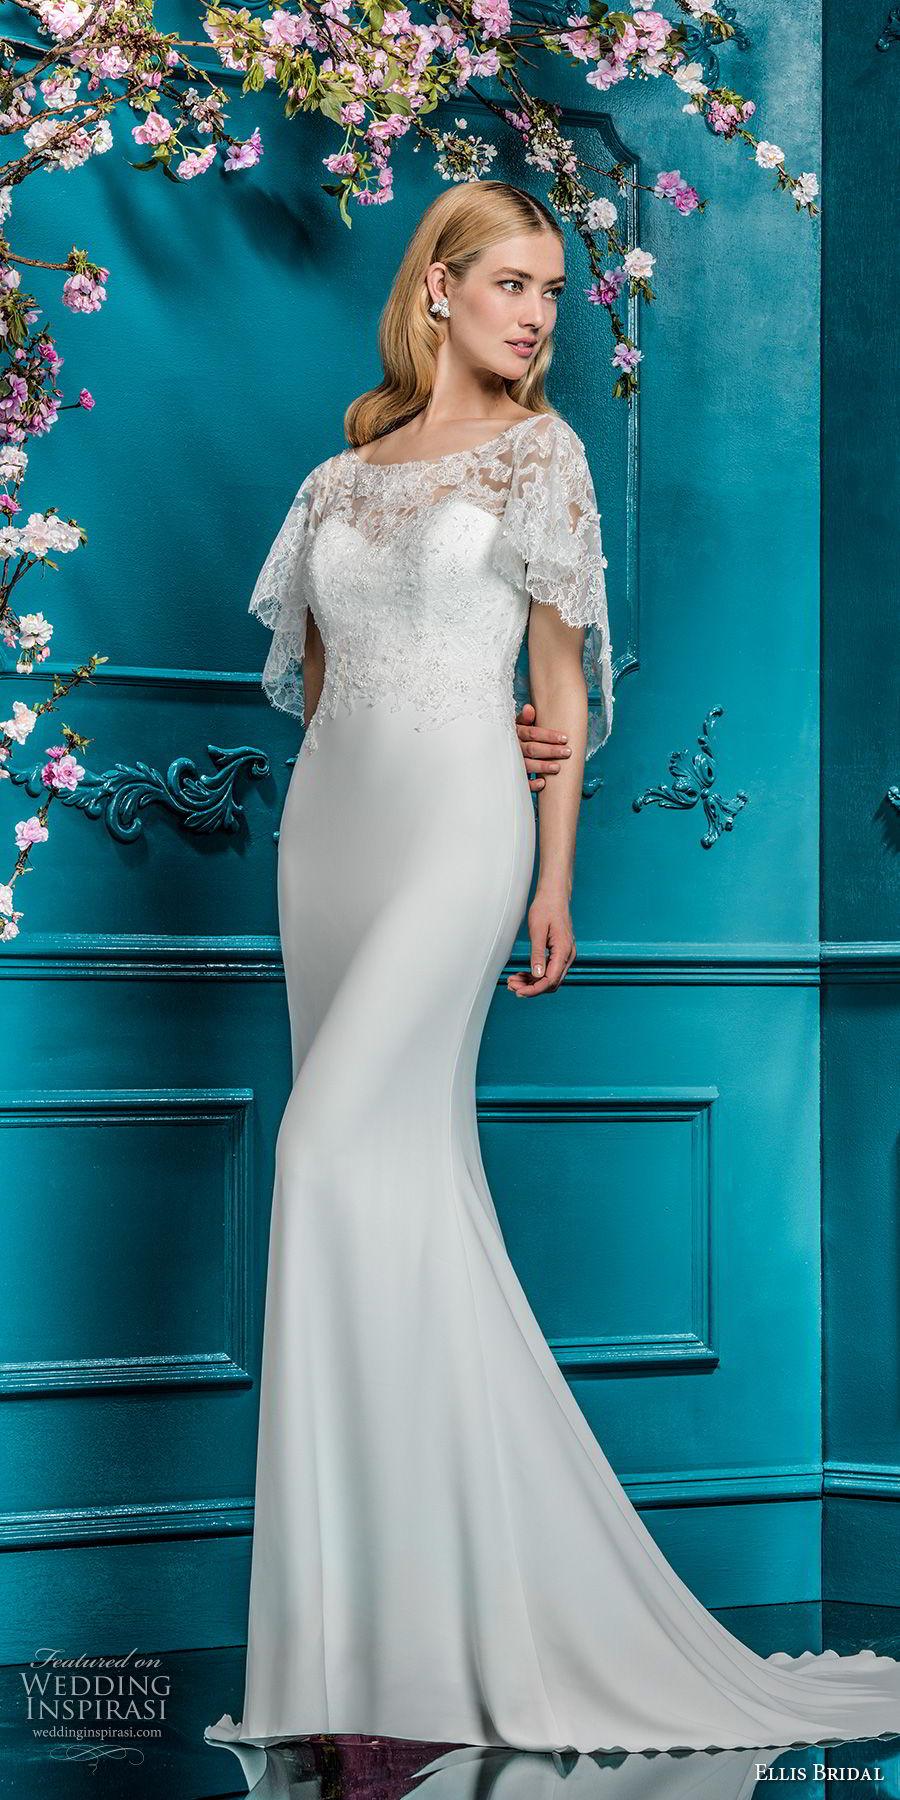 ellis bridals 2018 short flutter sleeves illusion boat sweetheart neckline heavily embellished bodice elegant sheath wedding dress open v back sweep train (14) mv